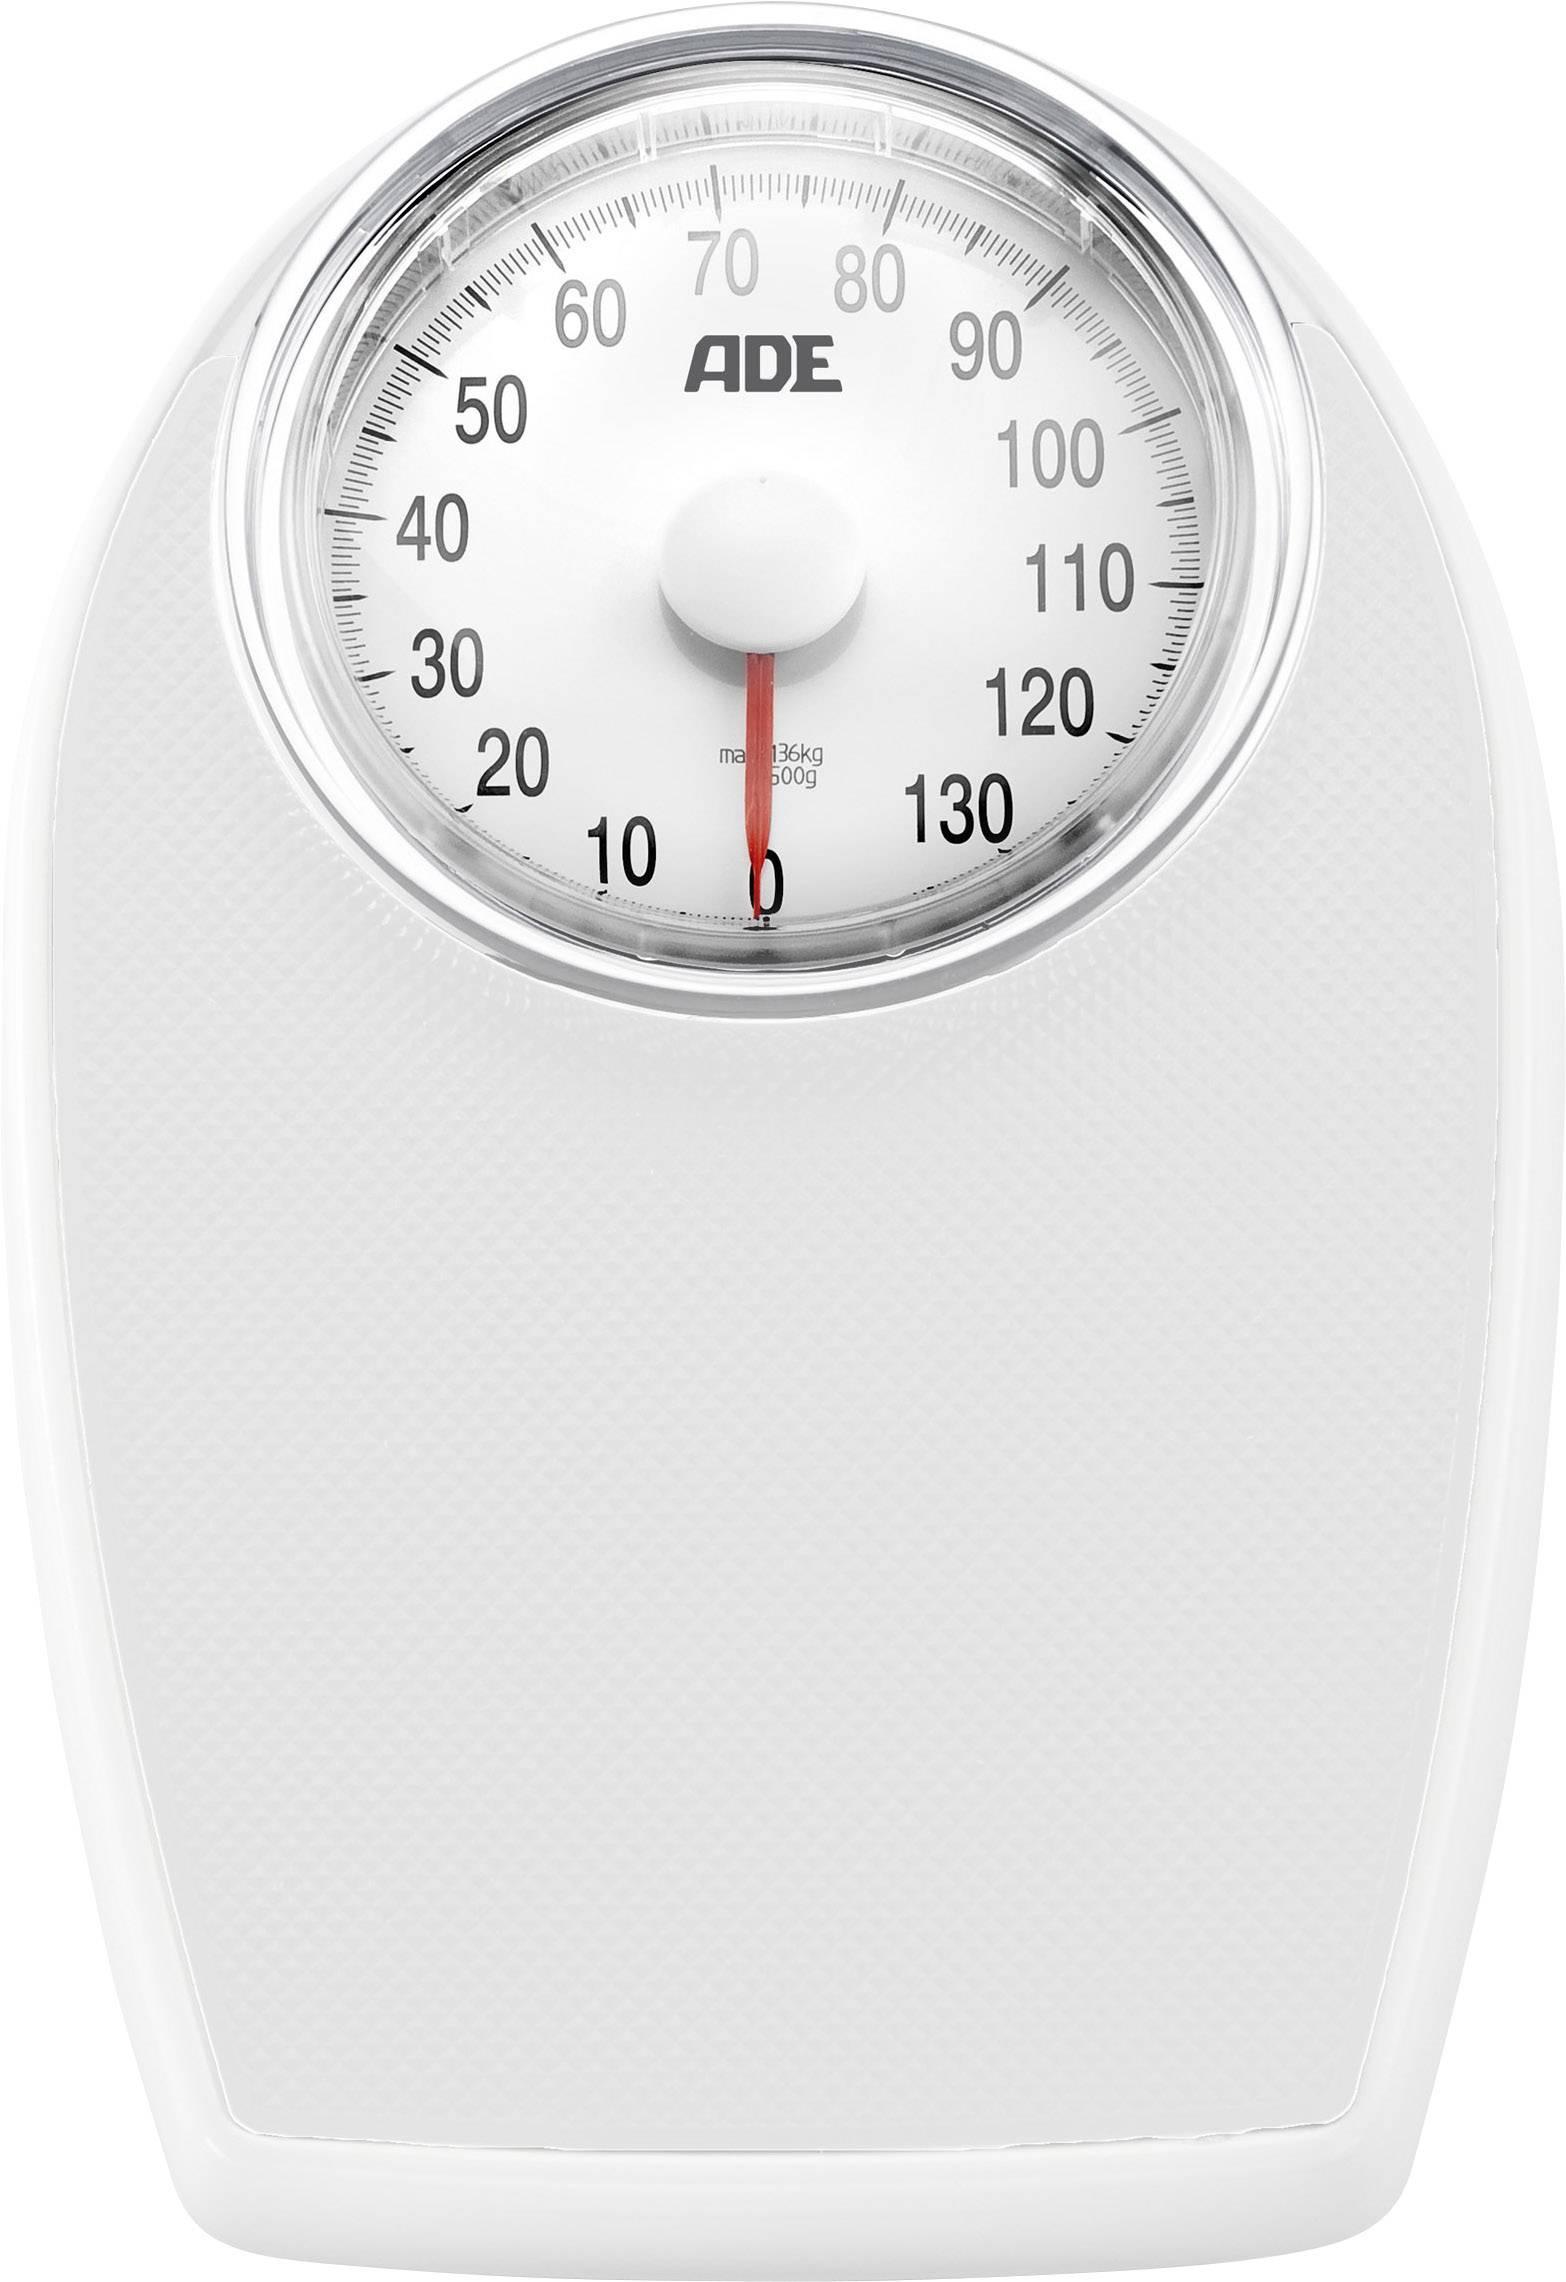 Ade Bm 701 Viktoria Analog Bathroom Scales Weight Range 136 Kg White